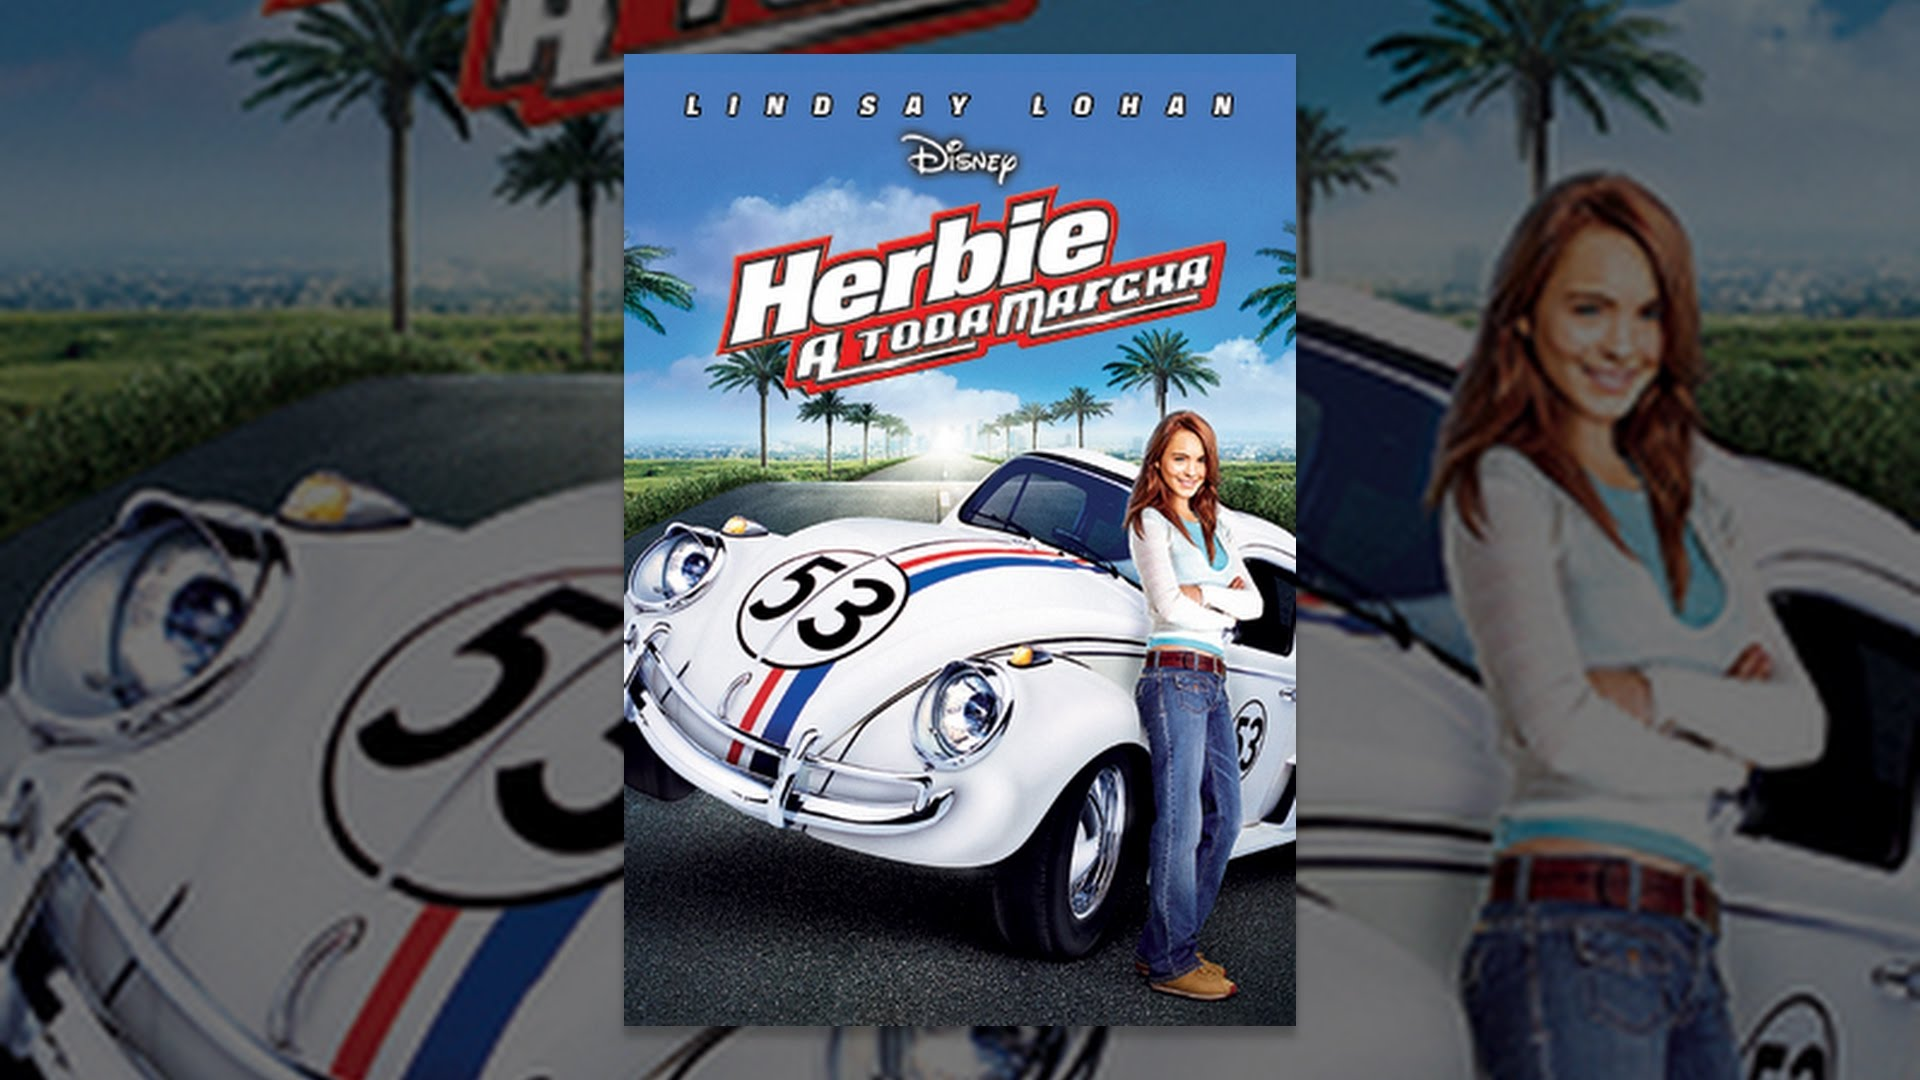 Herbie A Toda Marcha: Herbie: A Toda Marcha (Doblada)